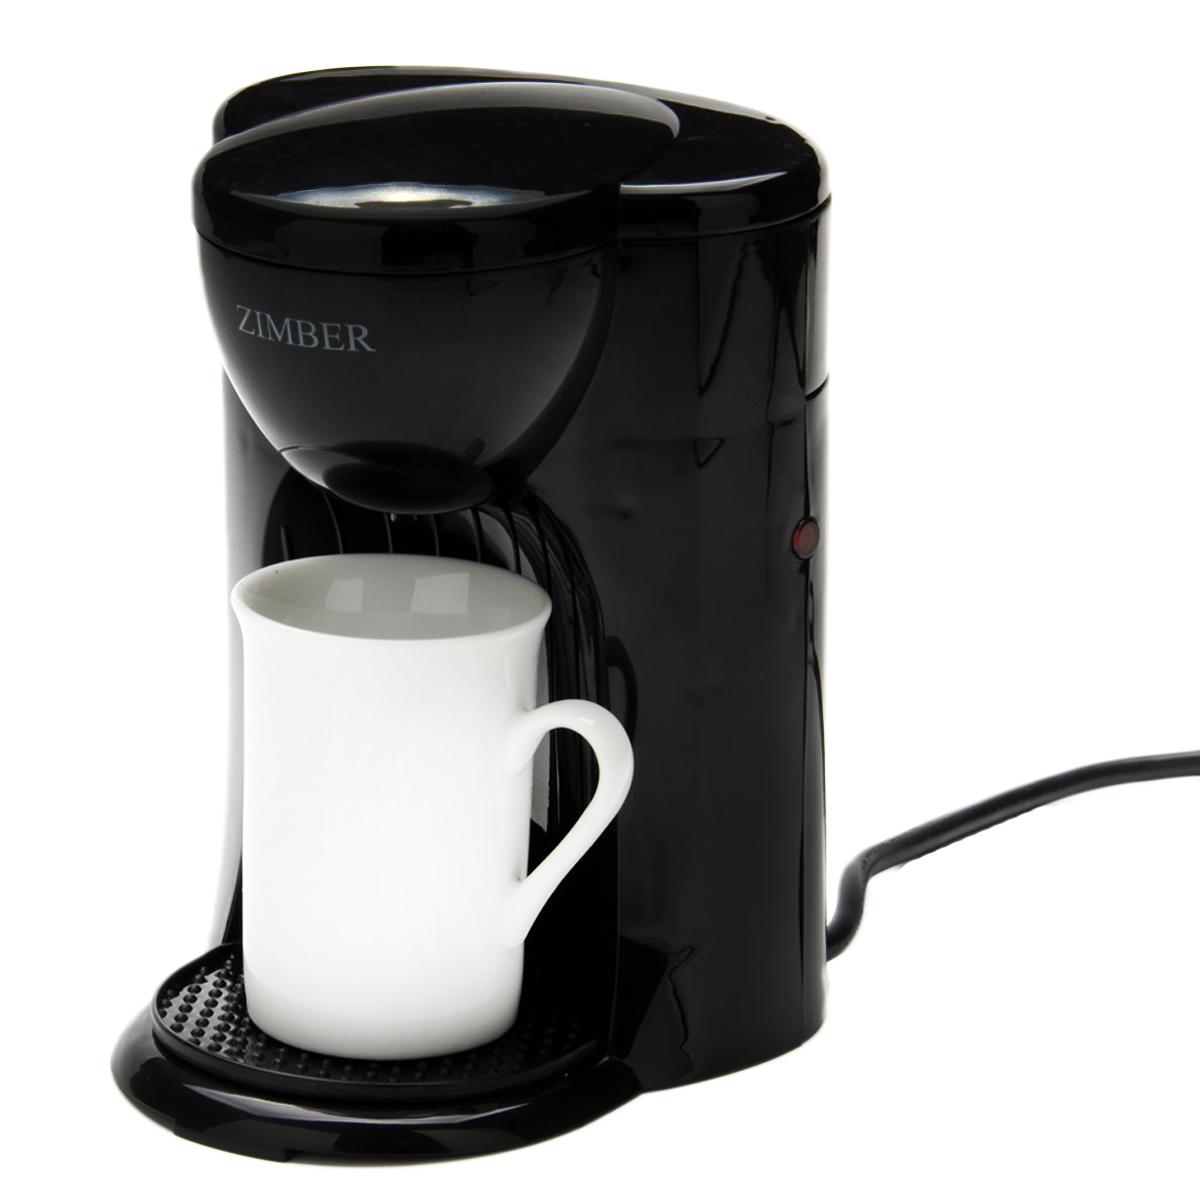 Zimber ZM-11011 кофеварка